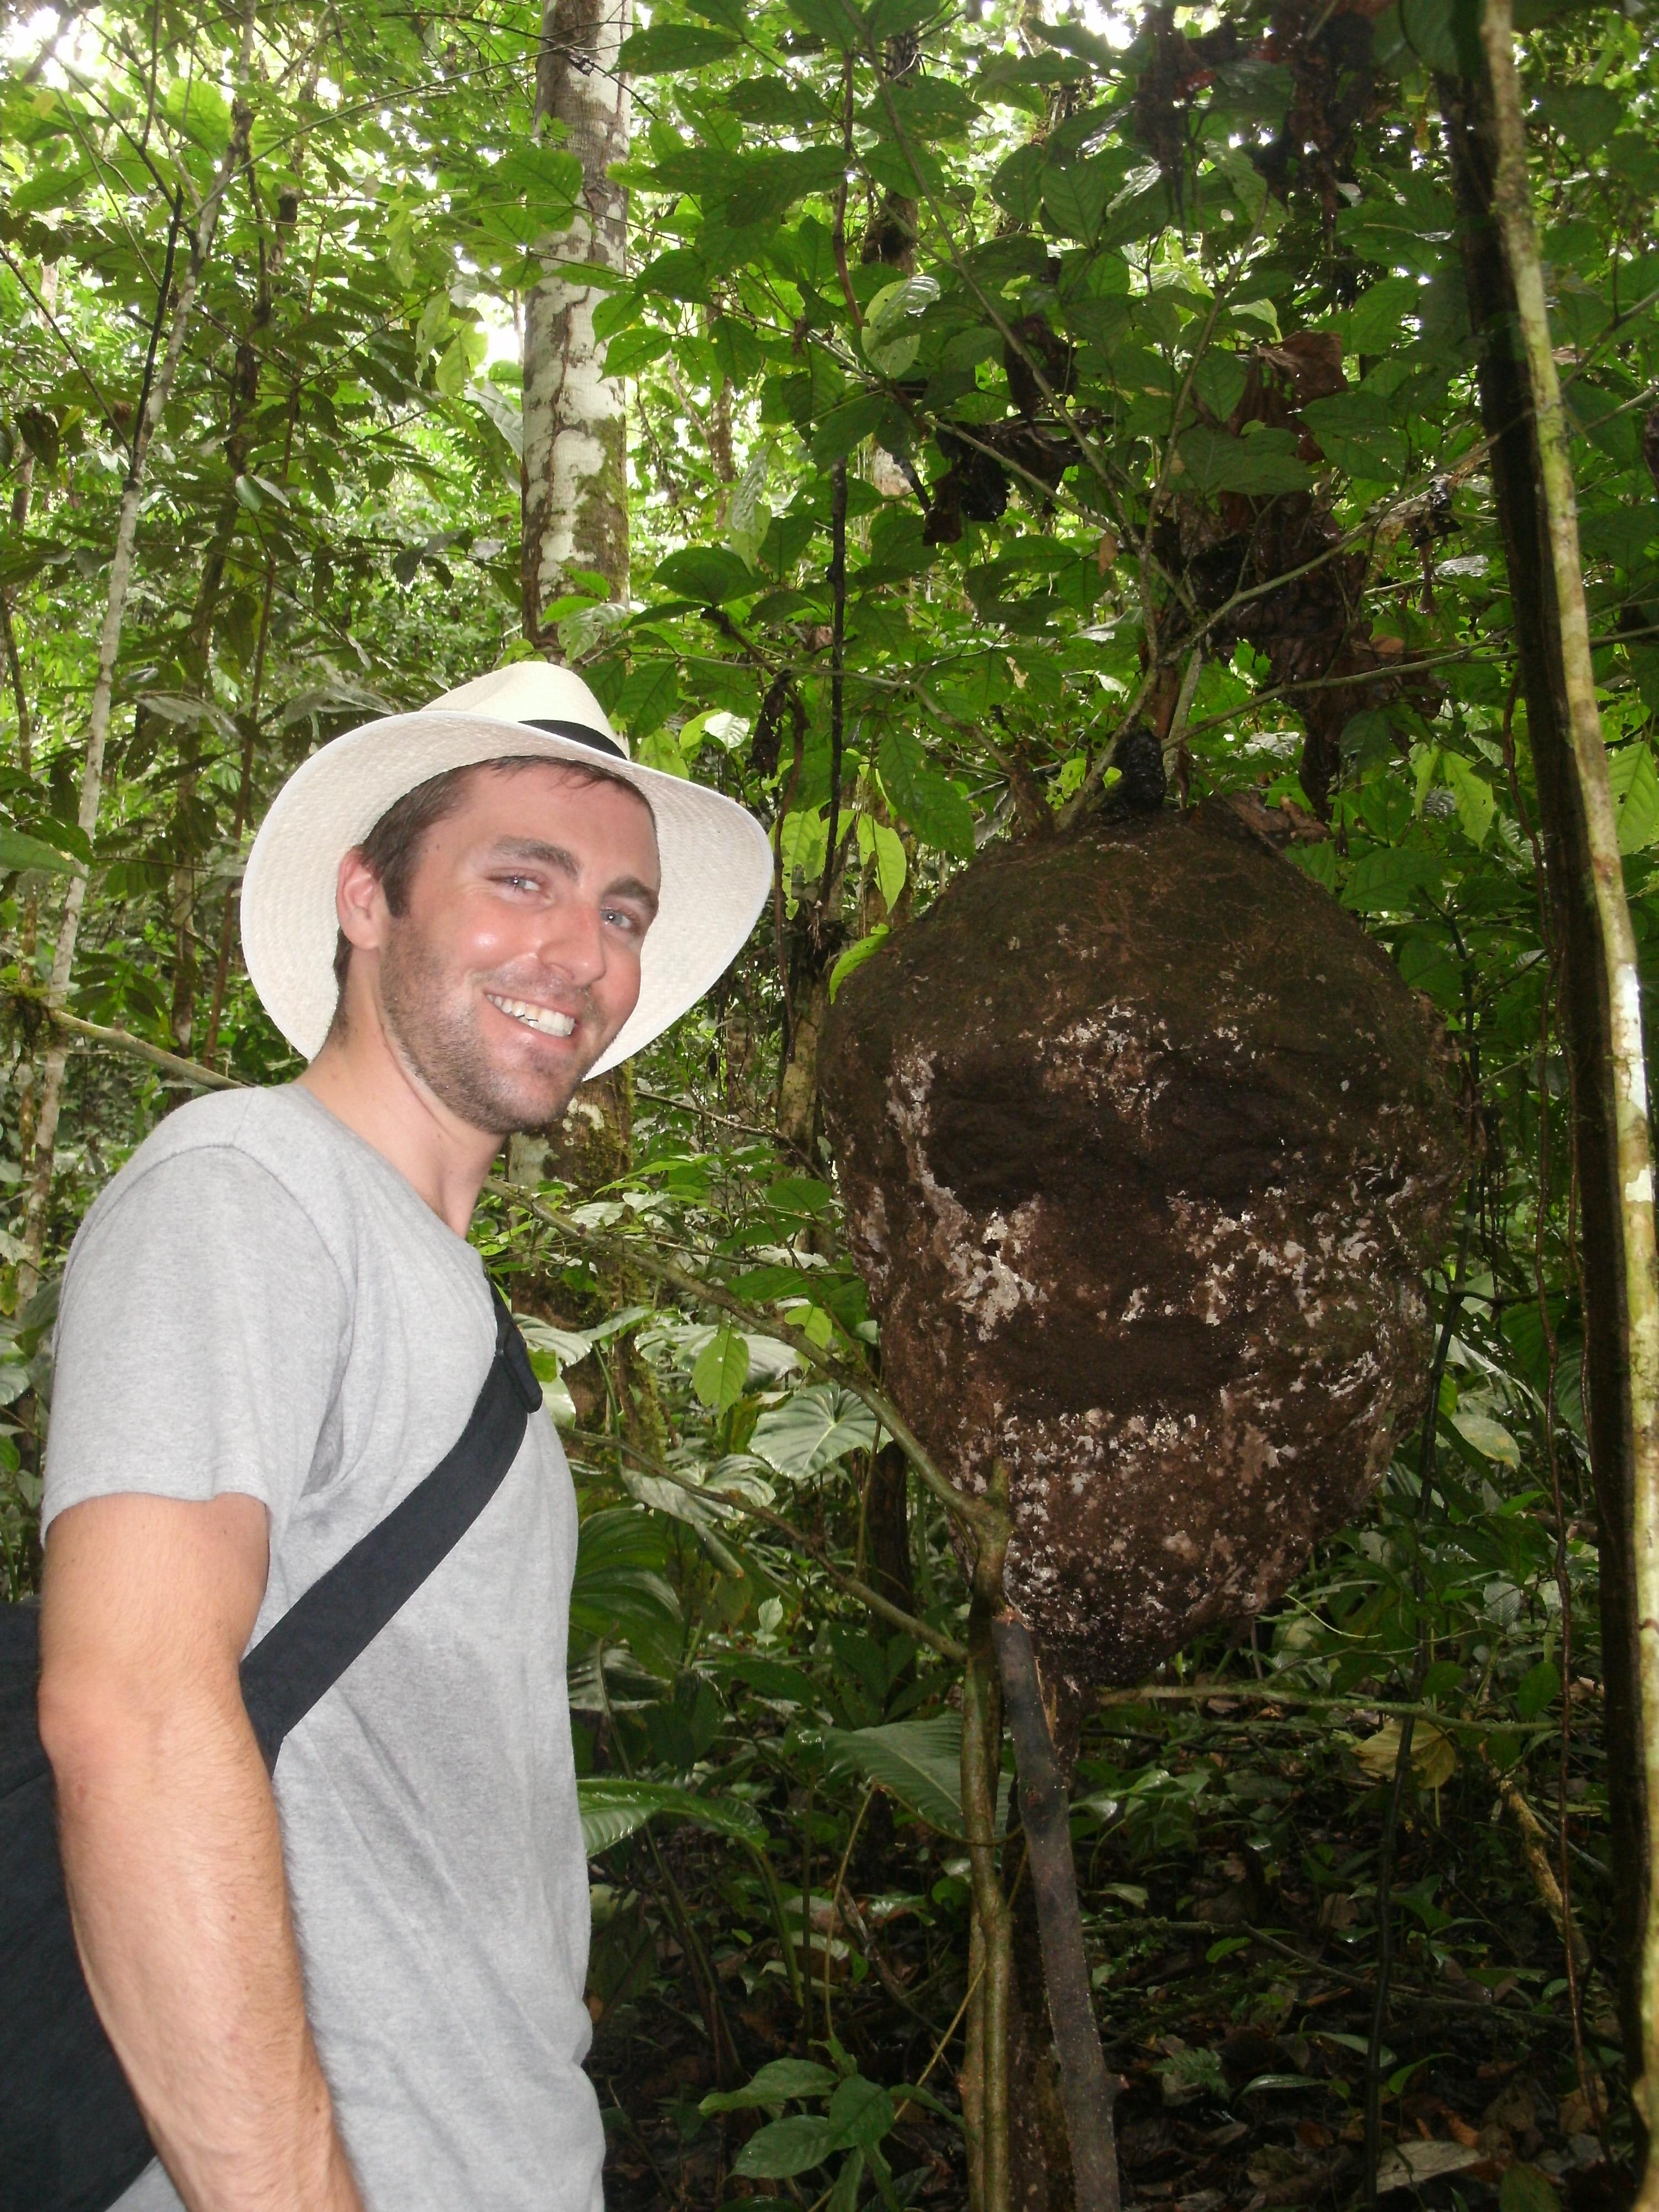 Man Next to Large Termite Nest Amazon Rainforest